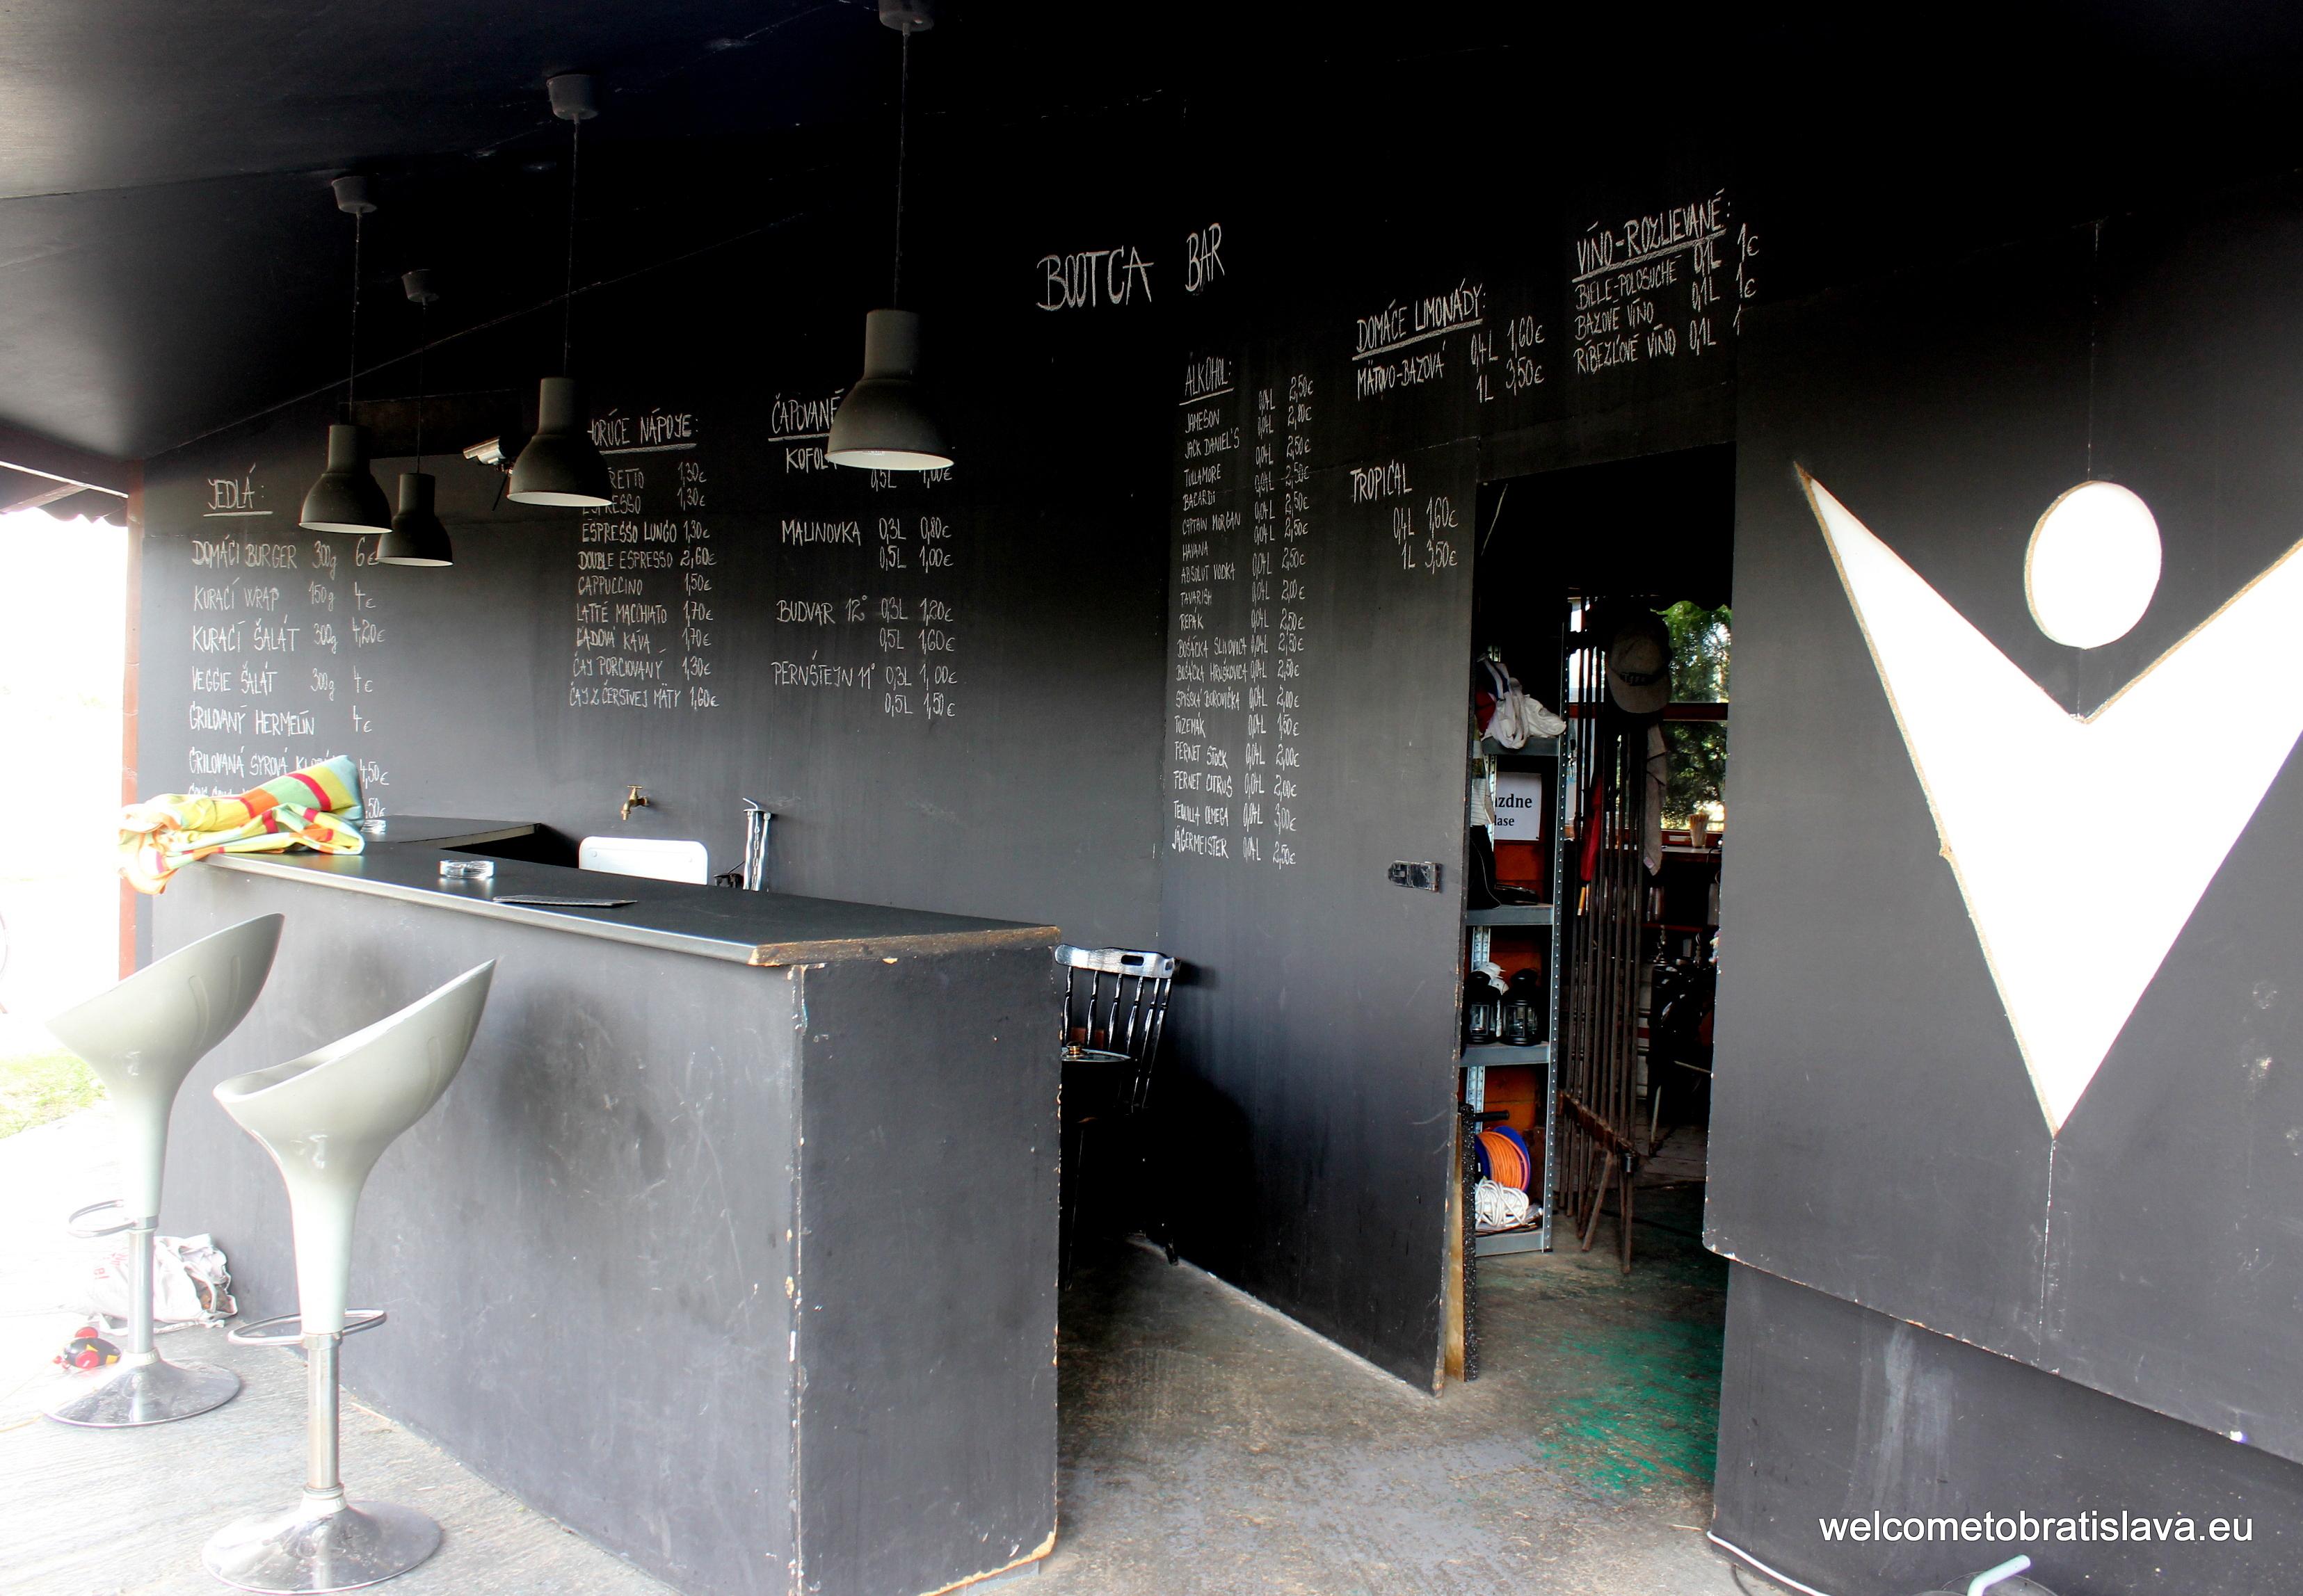 Bootca Bar Kuchajda